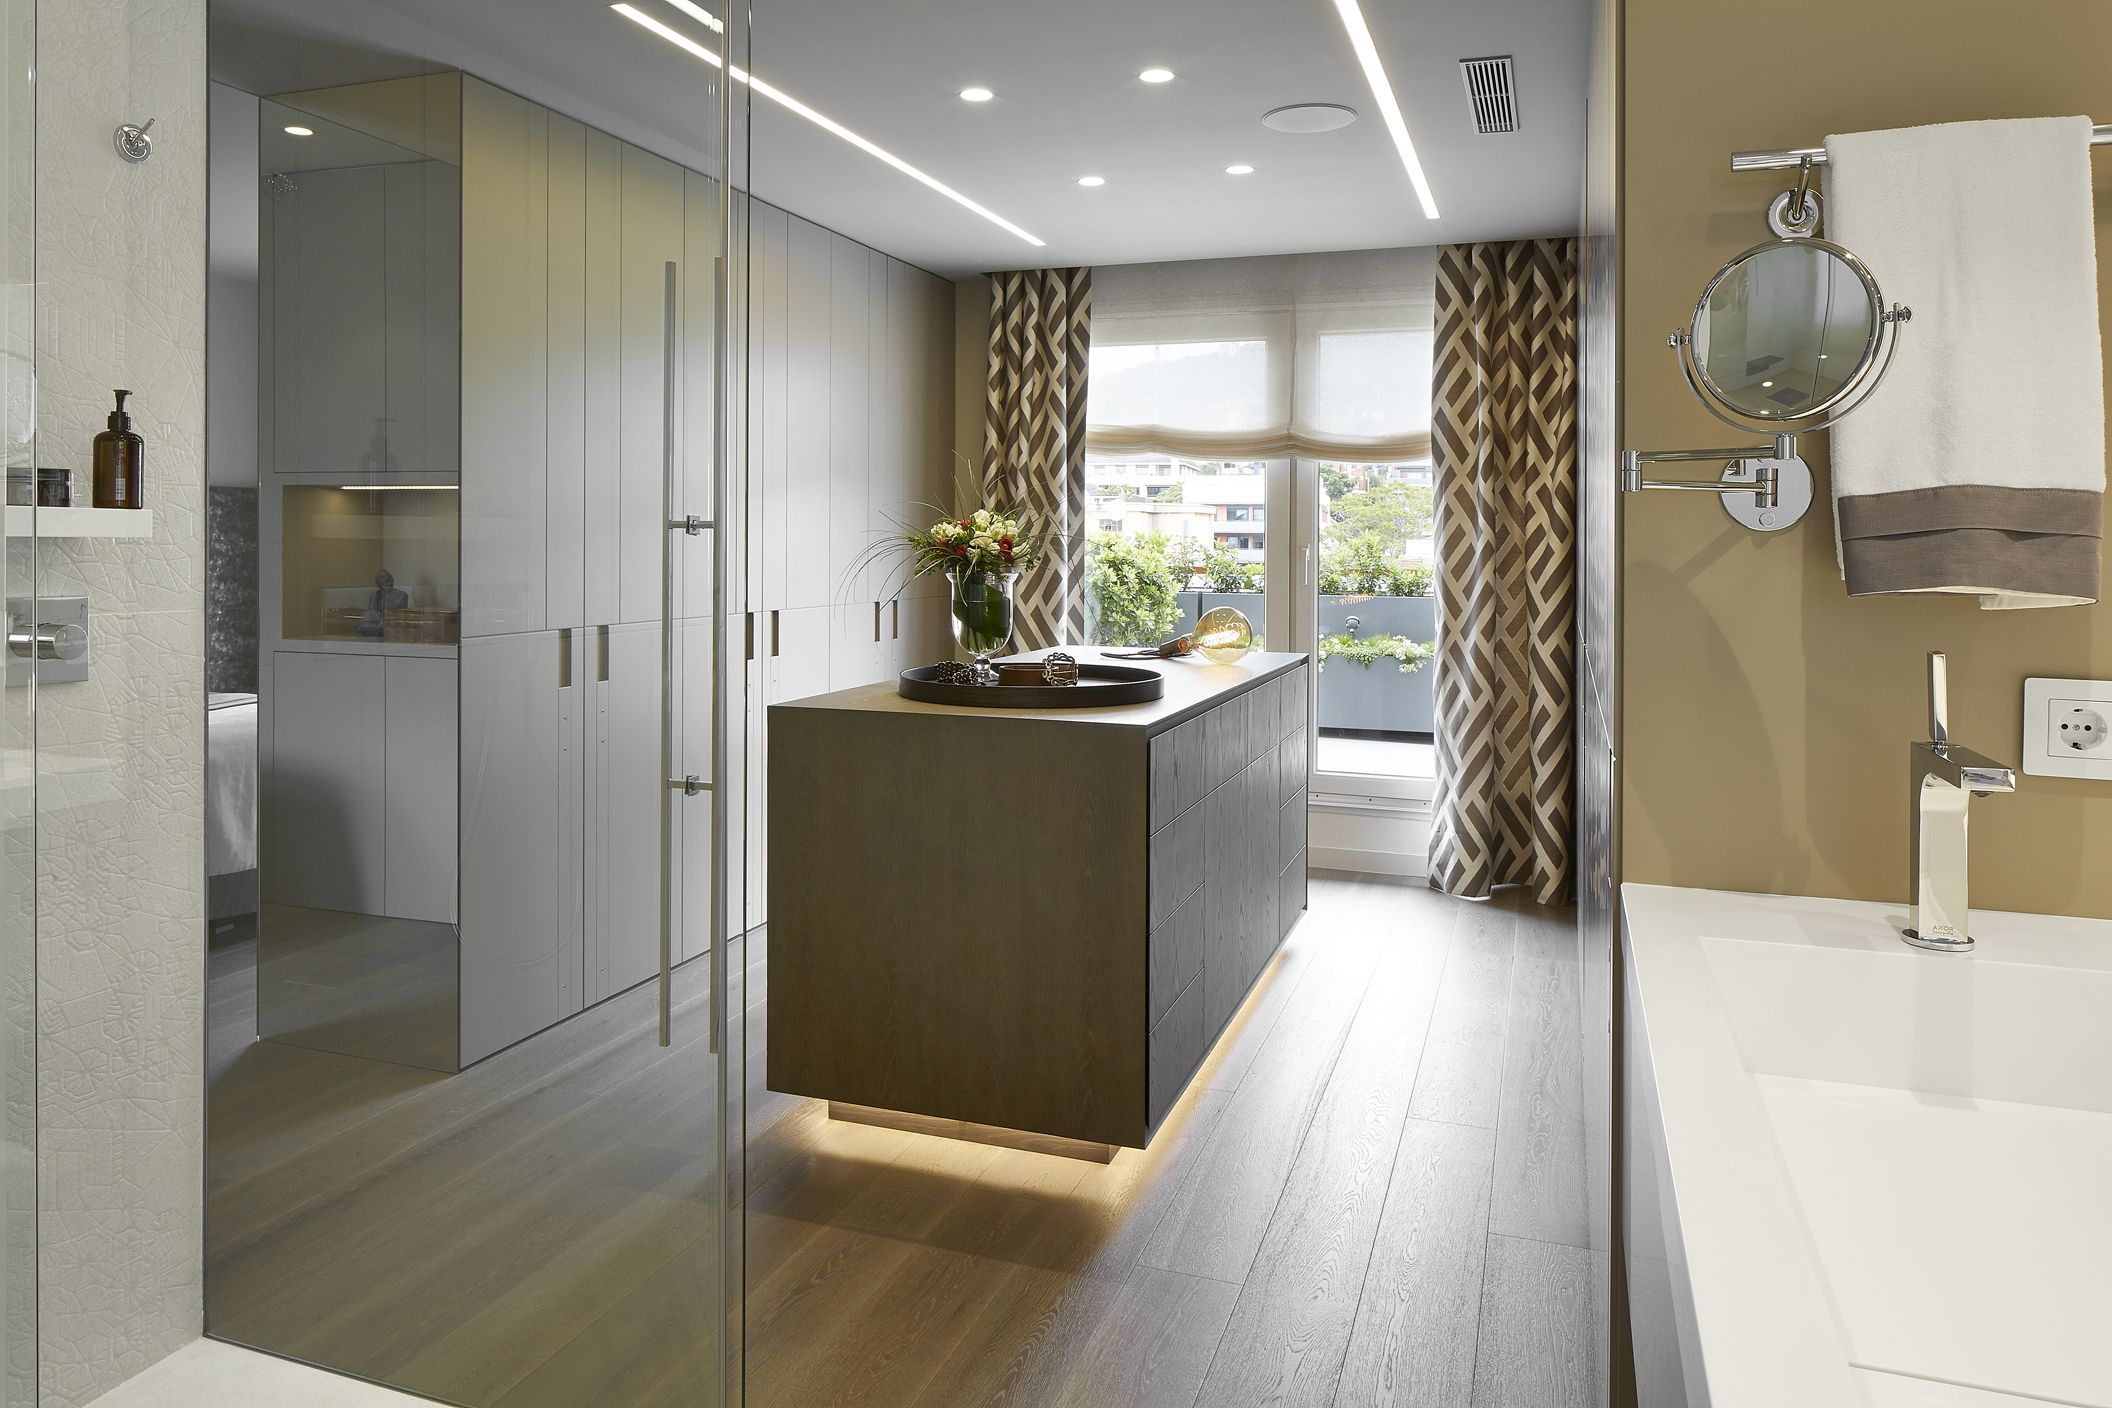 Molins interiors arquitectura interior interiorismo for Master interiorismo barcelona